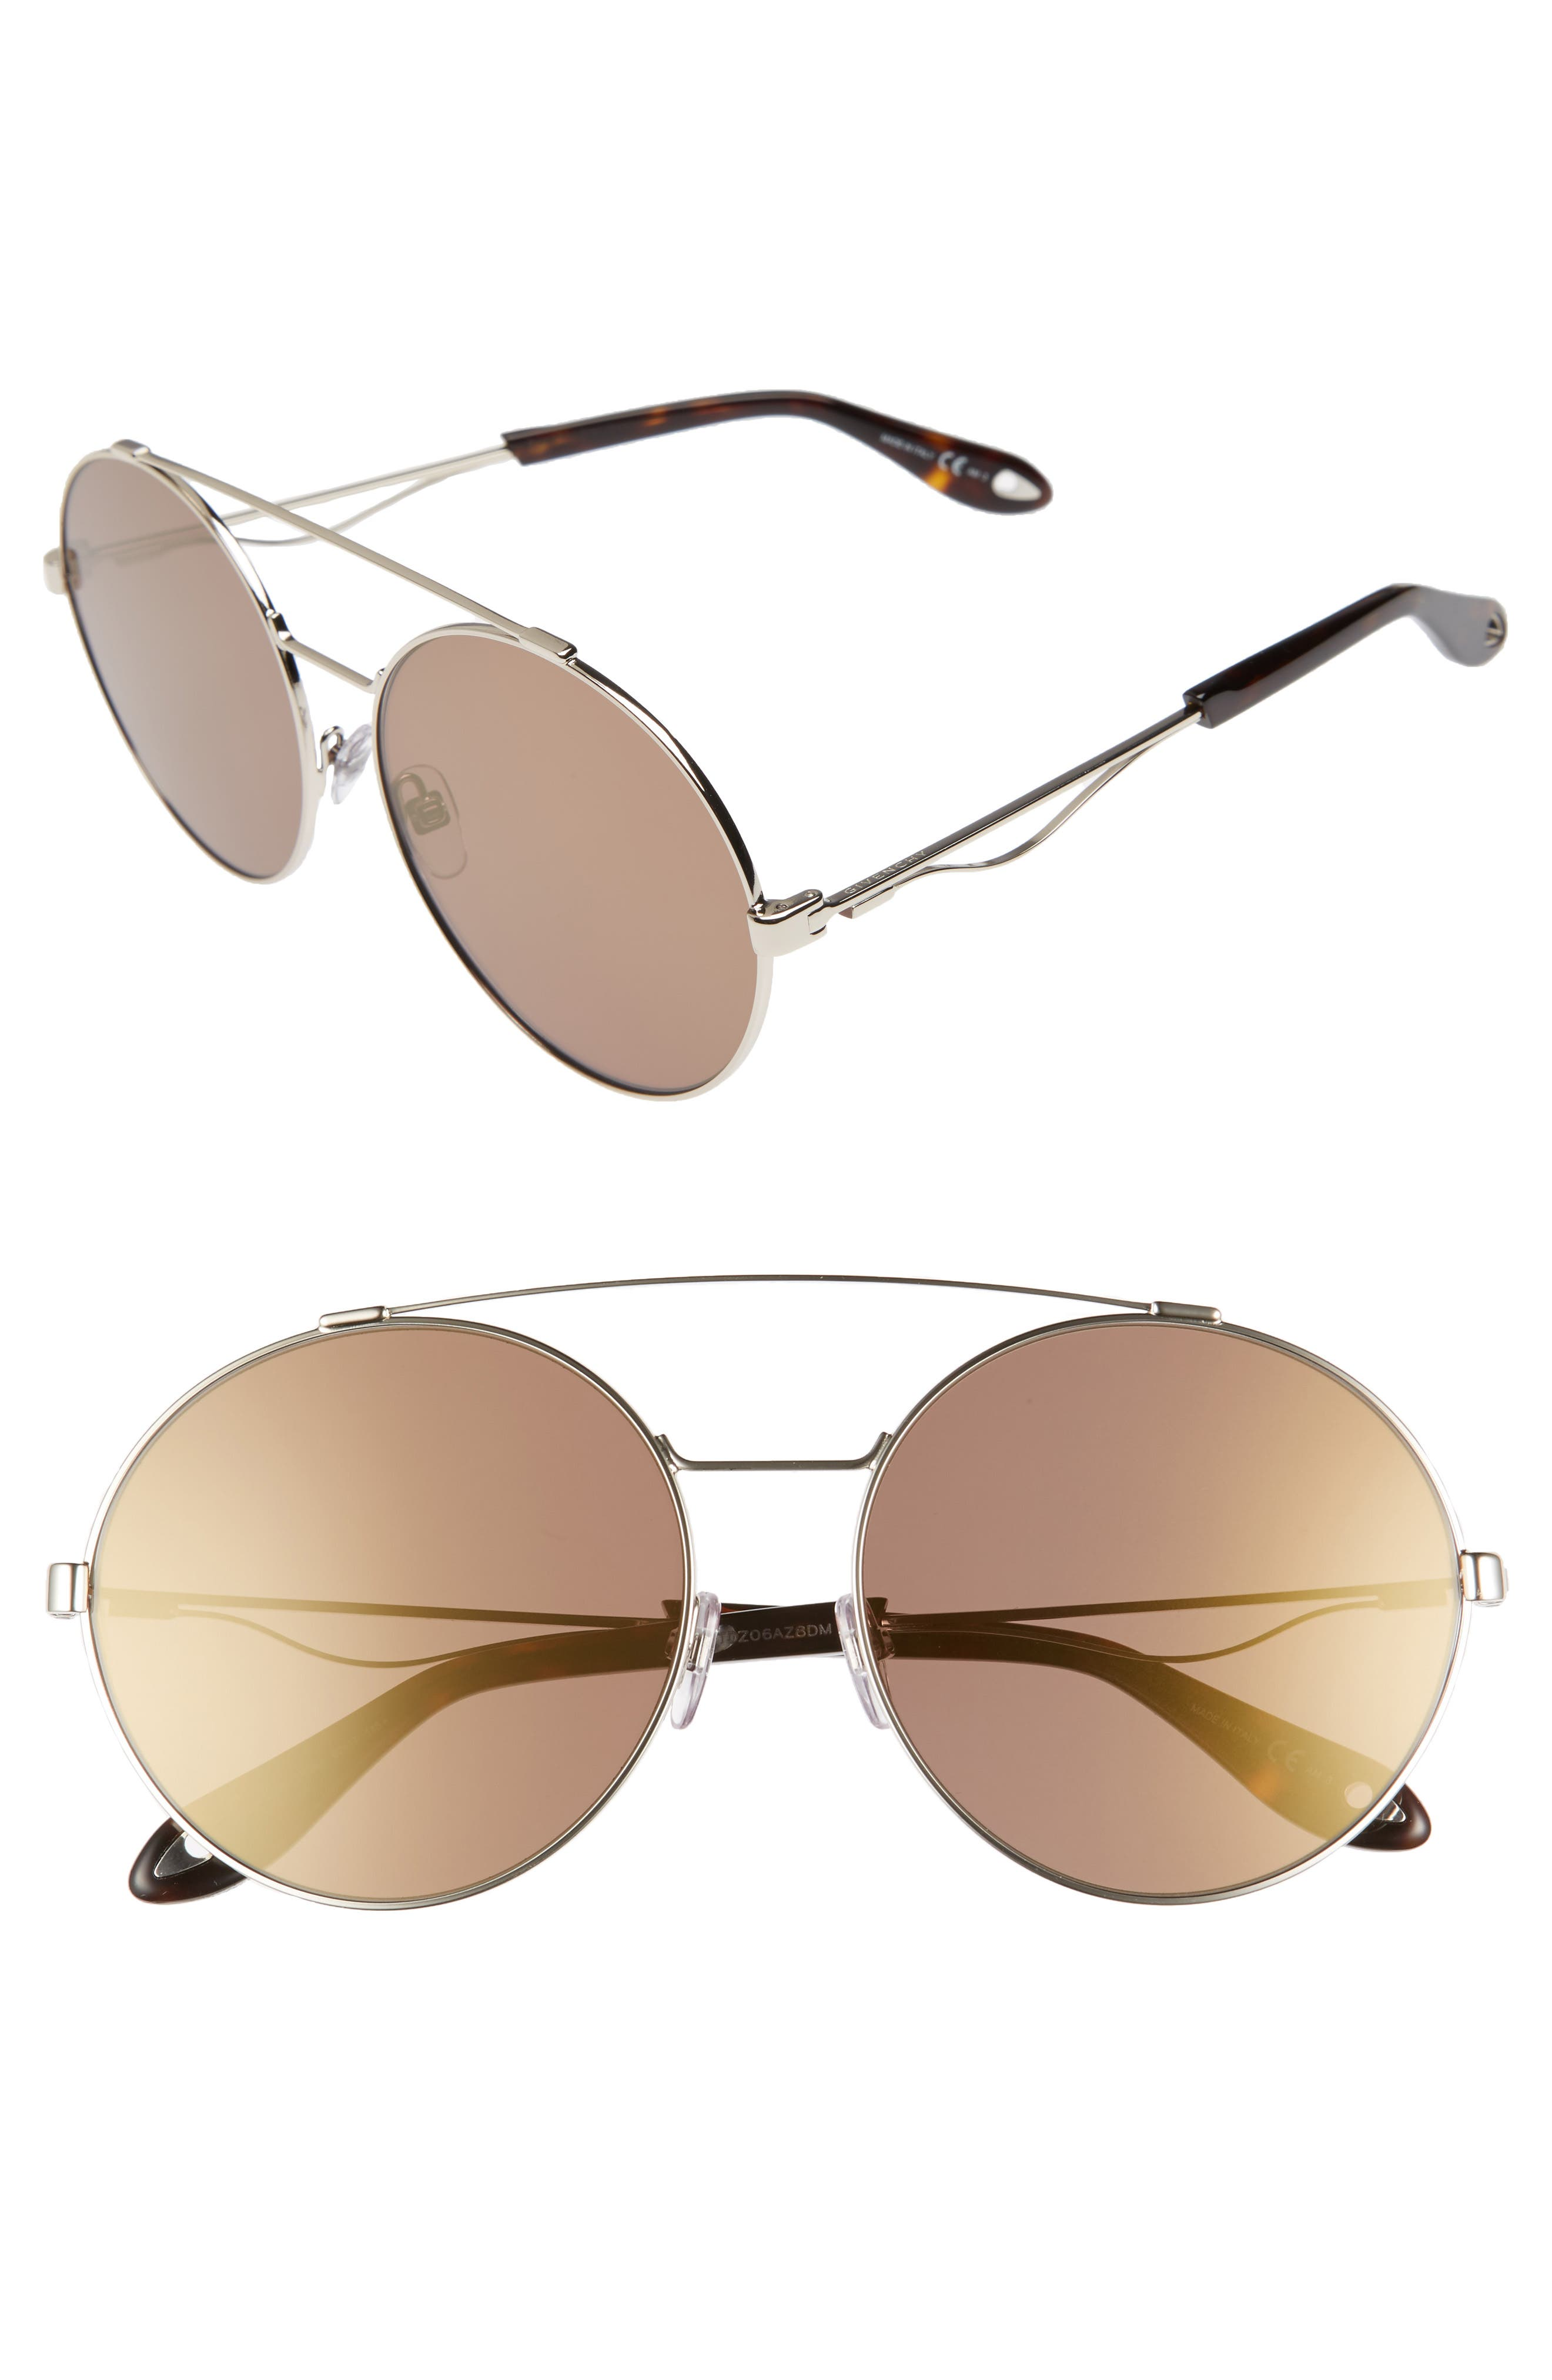 Main Image - Givenchy 62mm Oversize Round Sunglasses